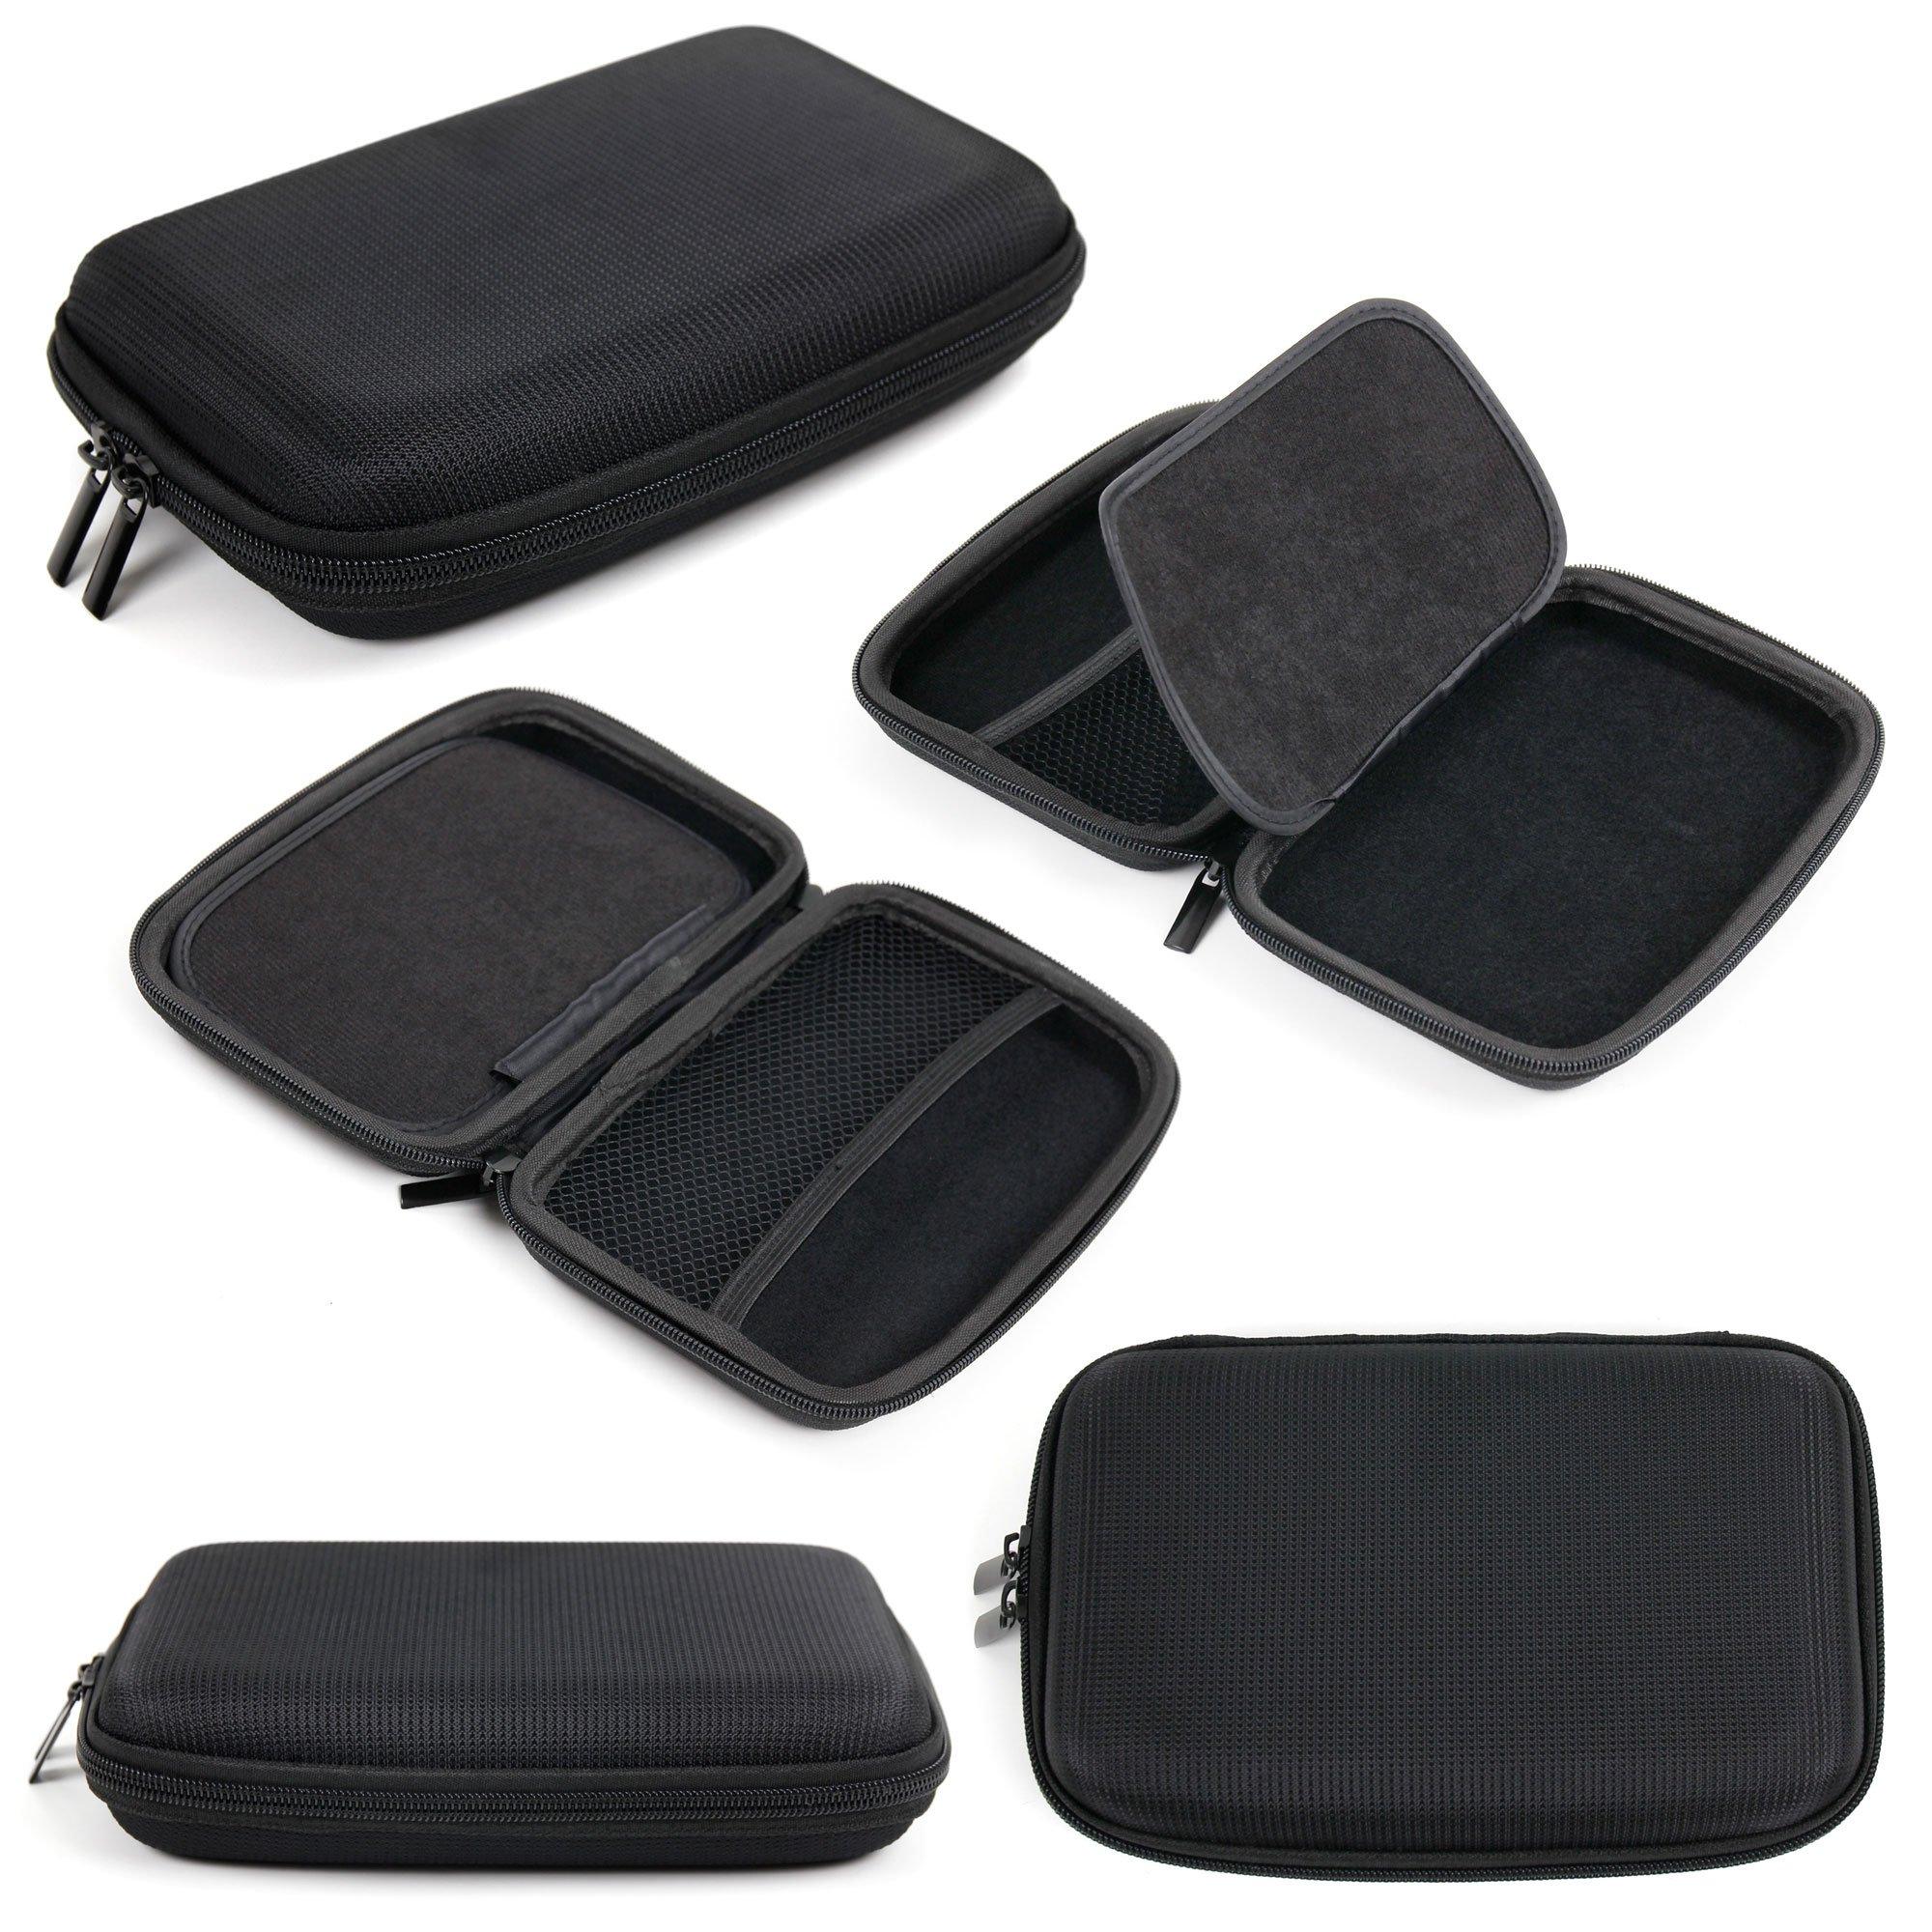 DURAGADGET Hard EVA Protective Case in Black for The Texas Instruments BA II Plus Professional Graphics Calculator